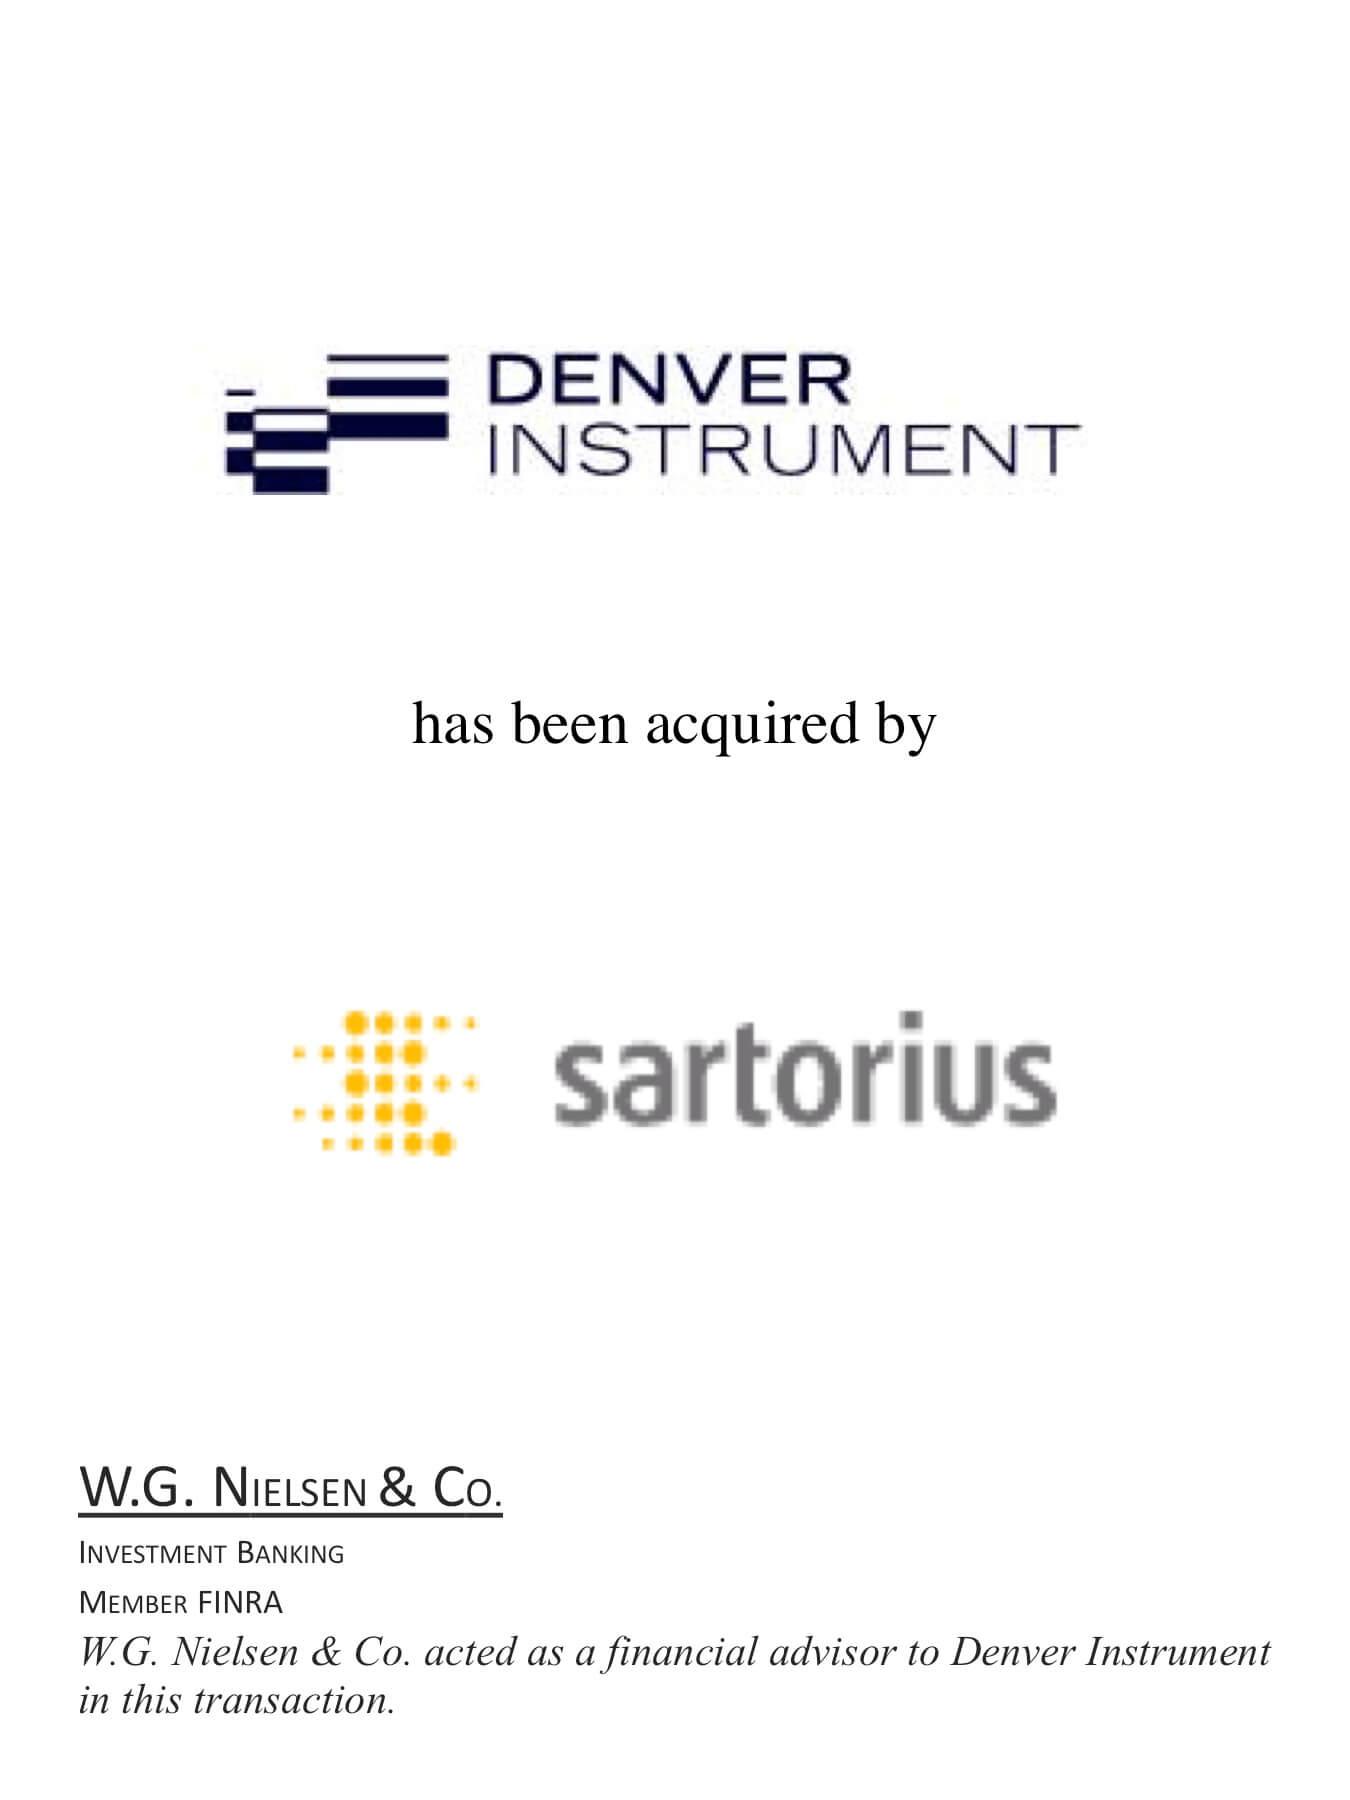 denver instrument investment banking transaction